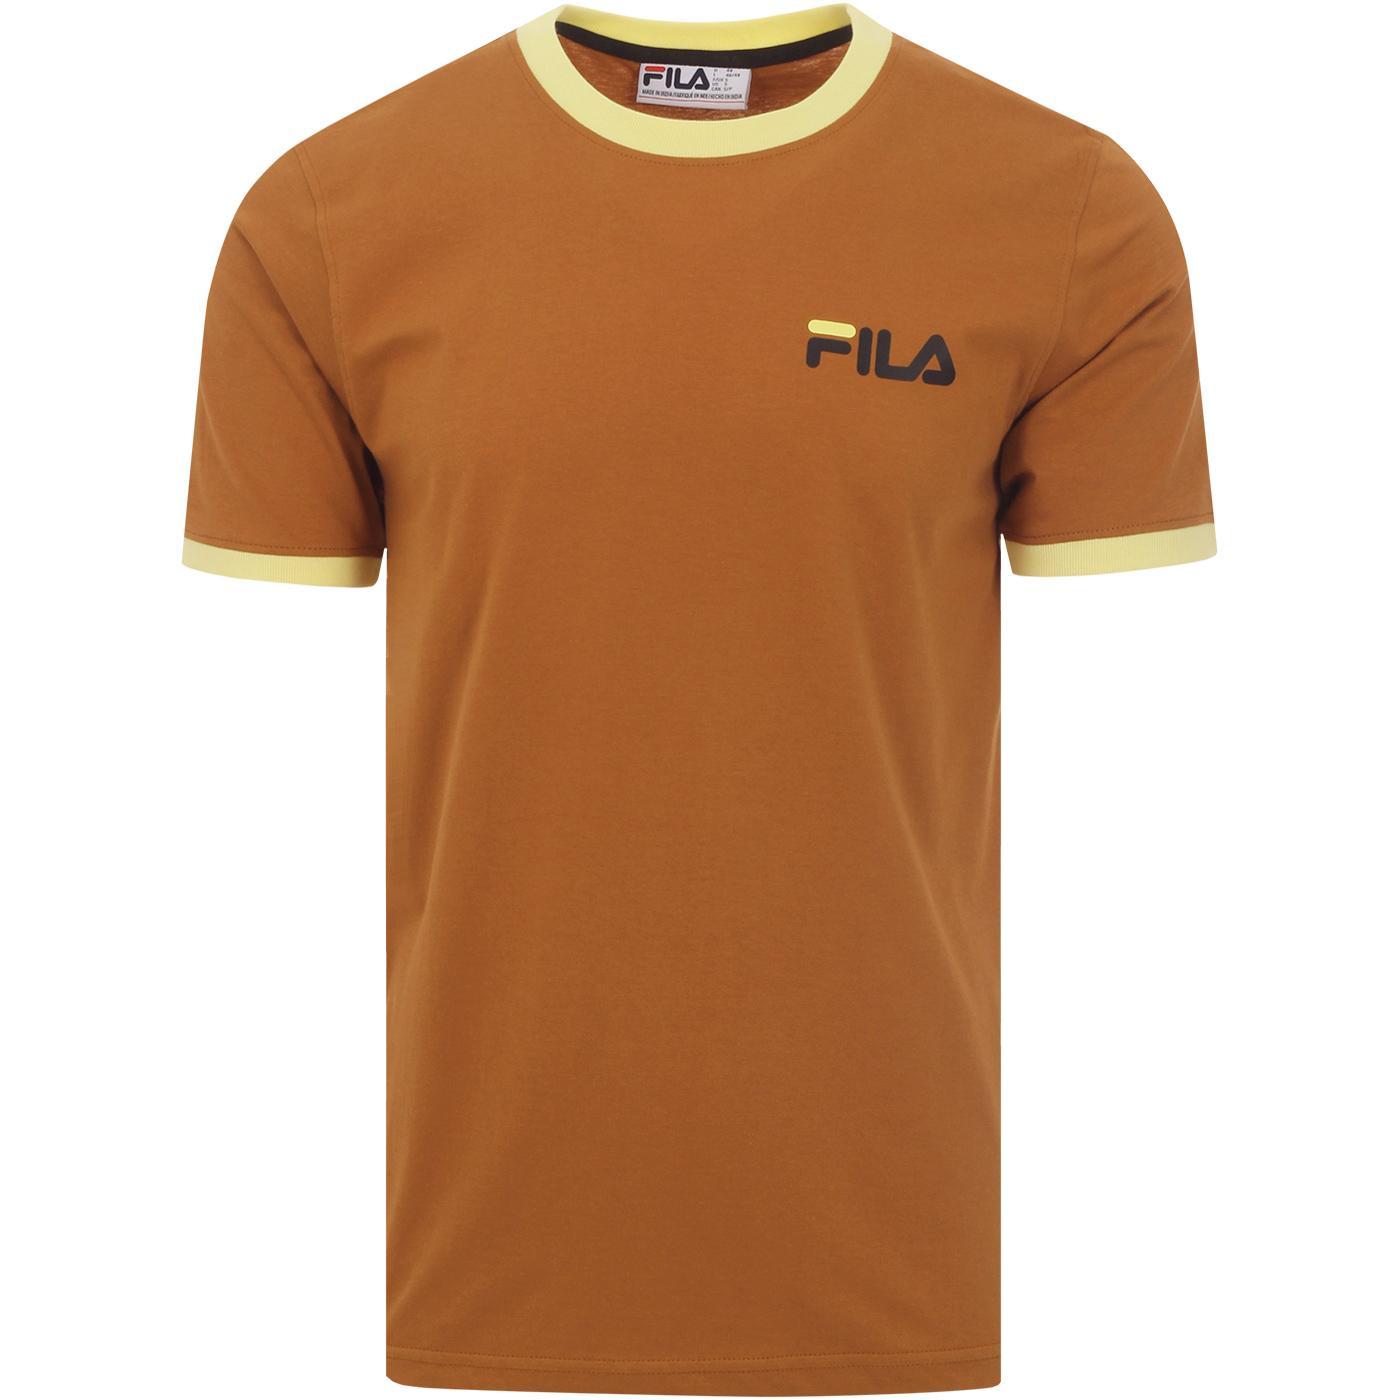 Roscoe FILA VINTAGE Retro 90s Ringer T-shirt BRAN